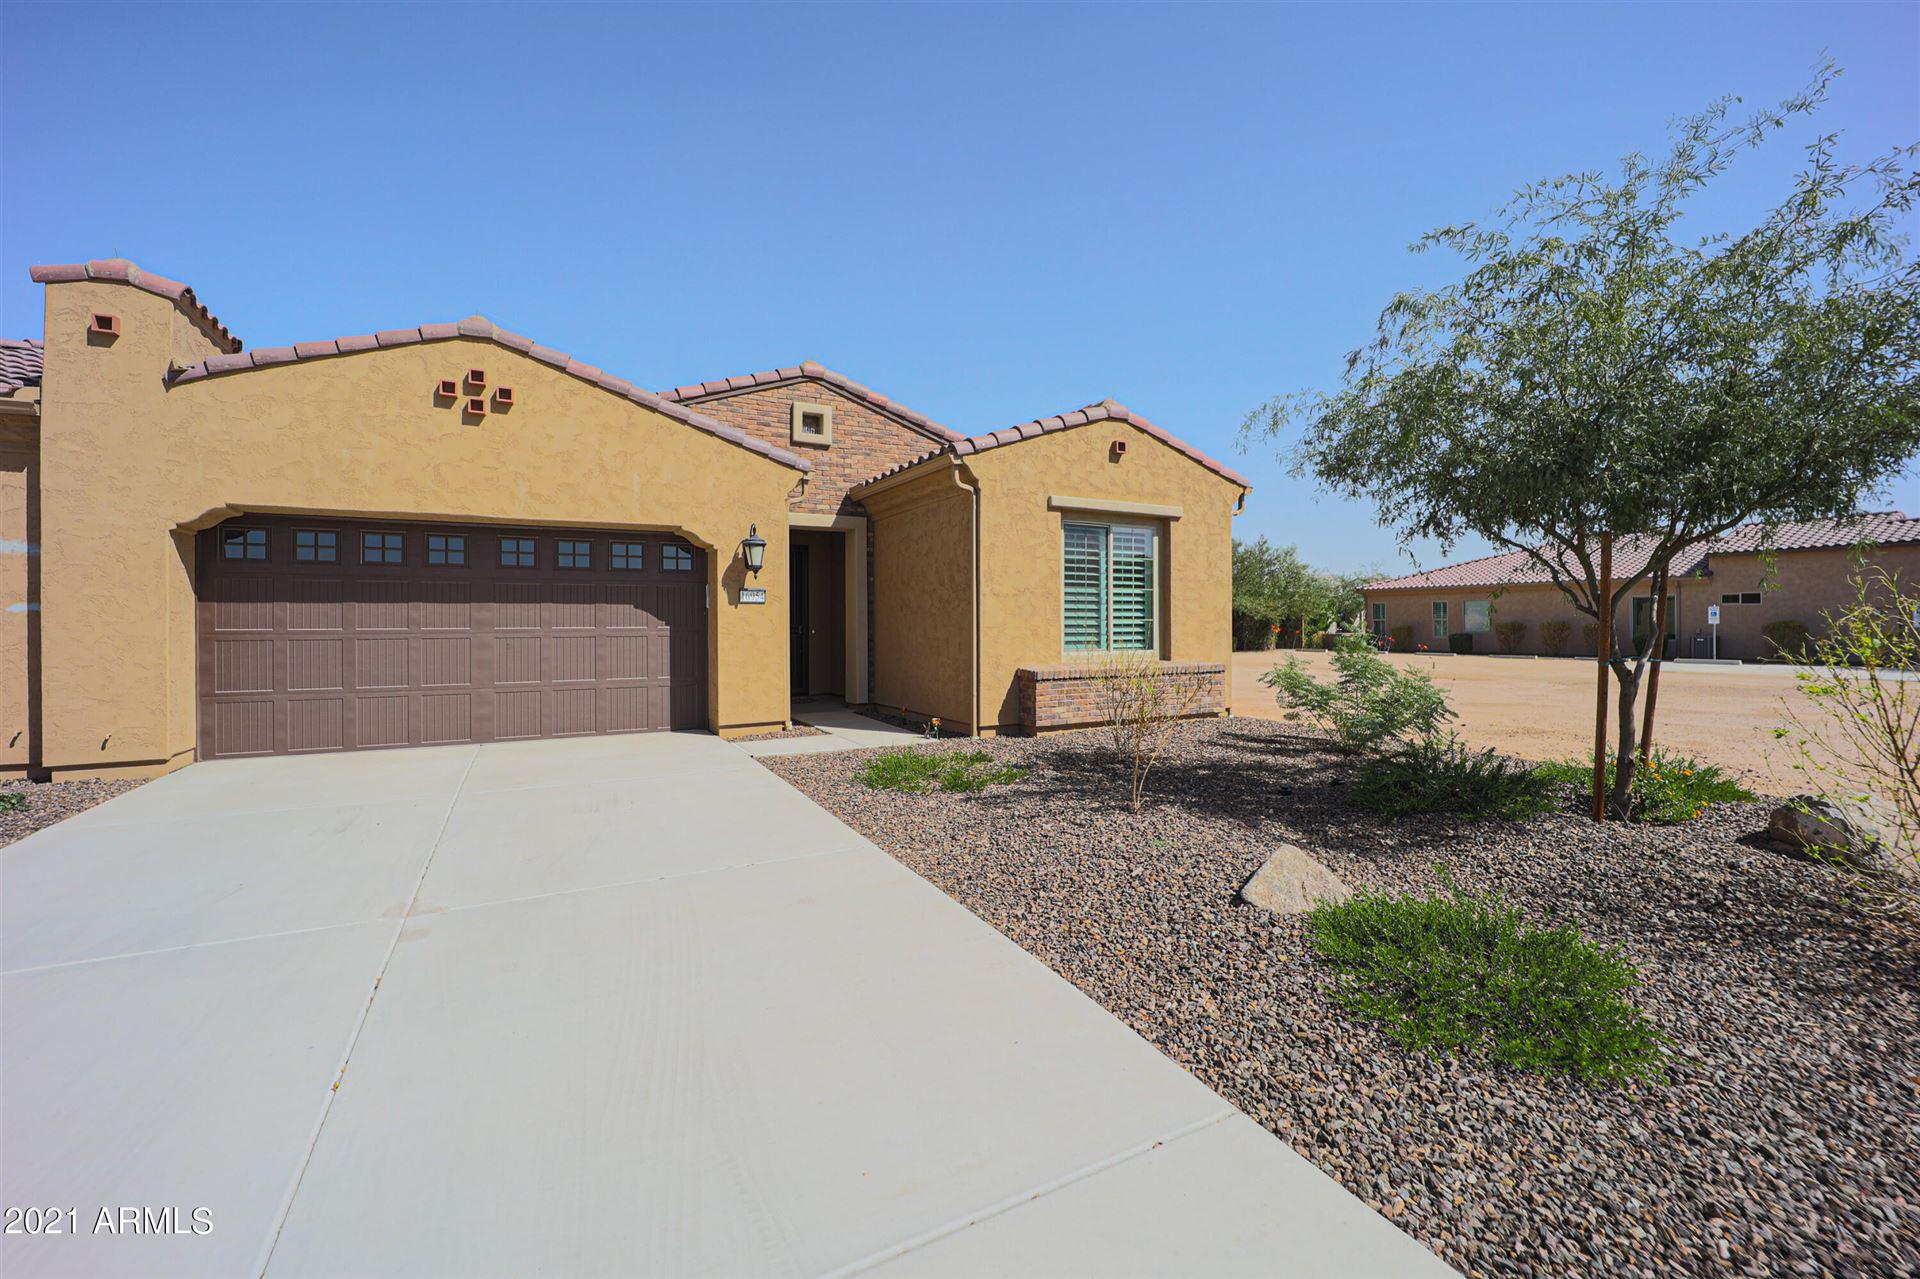 Photo of 16954 W SHERIDAN Street, Goodyear, AZ 85395 (MLS # 6305795)